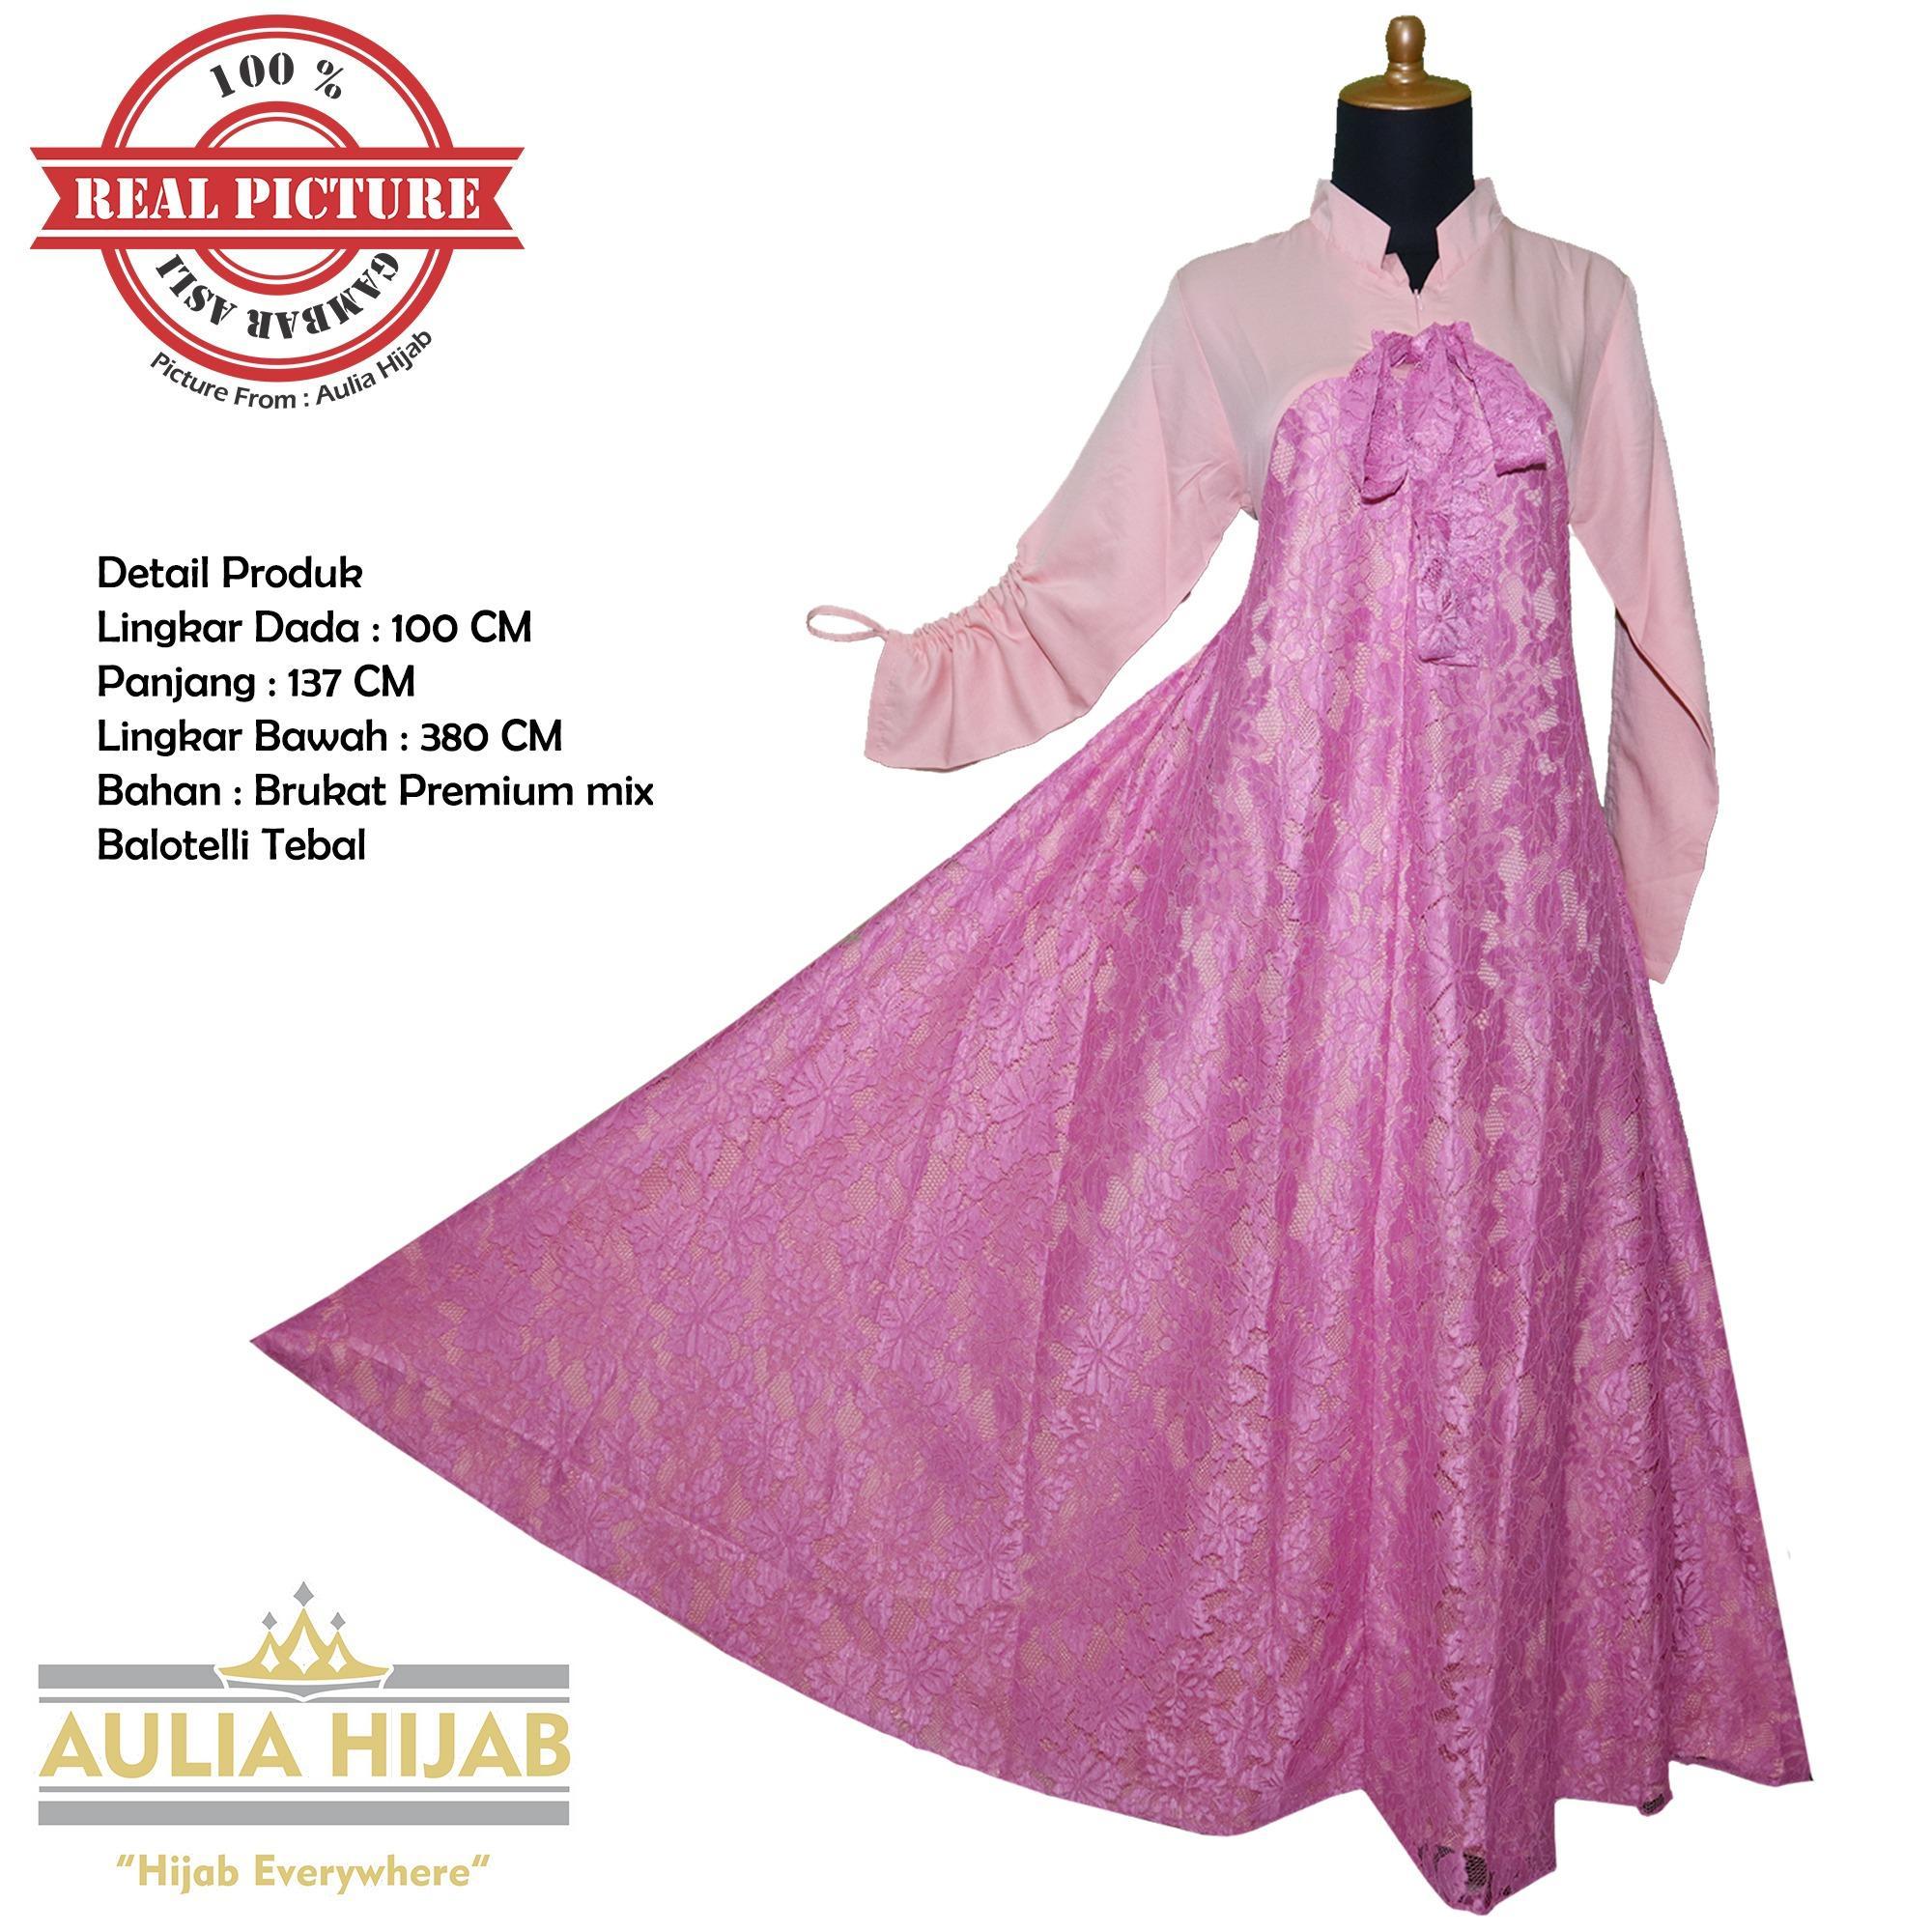 Aulia Hijab - Gamis Brukat Asli Alina Dress Bahan Brukat/Gamis Pesta/Gamis Kerja/Gamis Kondangan/Gamis Brukat/Gamis Brokat/Gamis Terbaru/Gamis Real Picture/Gamis Cantik